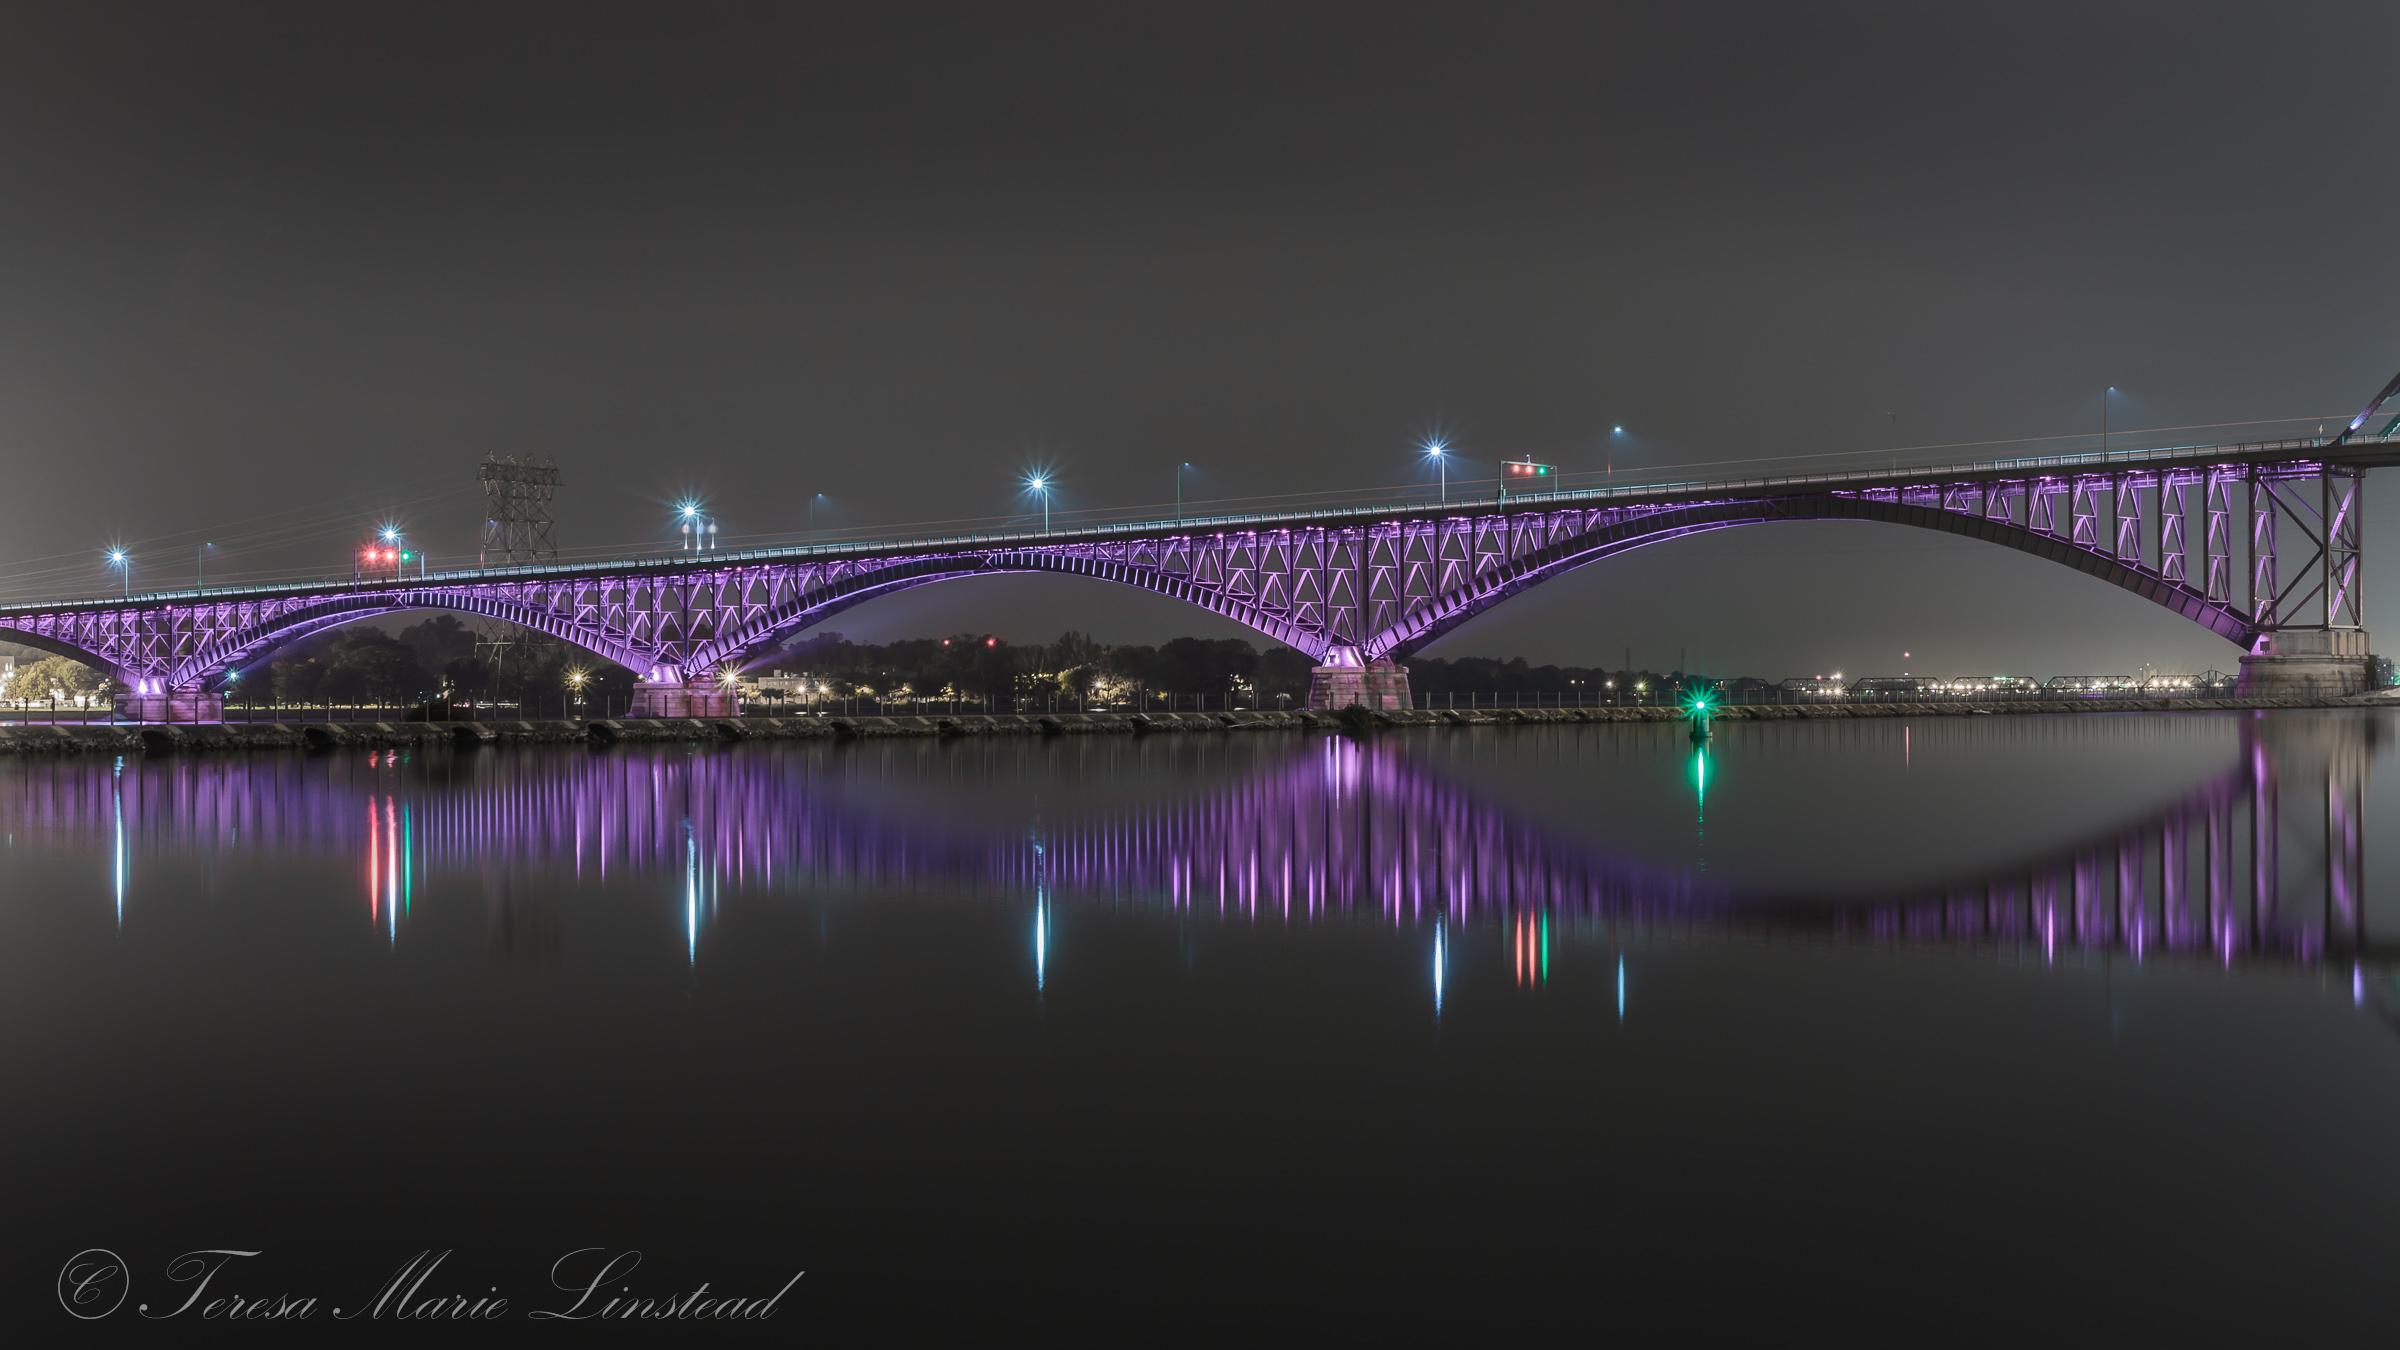 City Cityscape Night Water Reflection Sky Purple Evening Bridge Metropolis Buffalo Structure Light Longexposure Telephoto Reflections